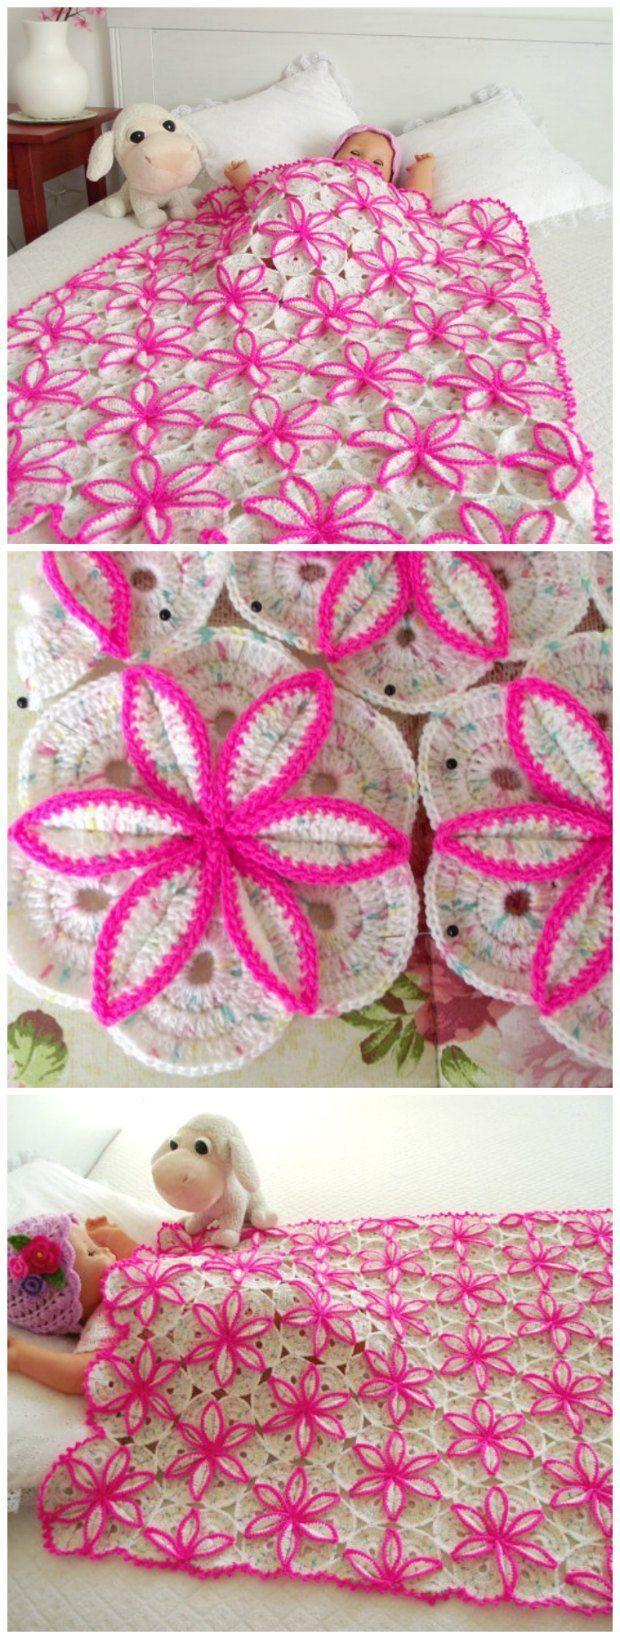 Mattonella Uncinetto Copertina Baby Coperta Fiore Cose Crochet Flower Motif Motivos Hexagonales Pinterest Couverture Florale Payant